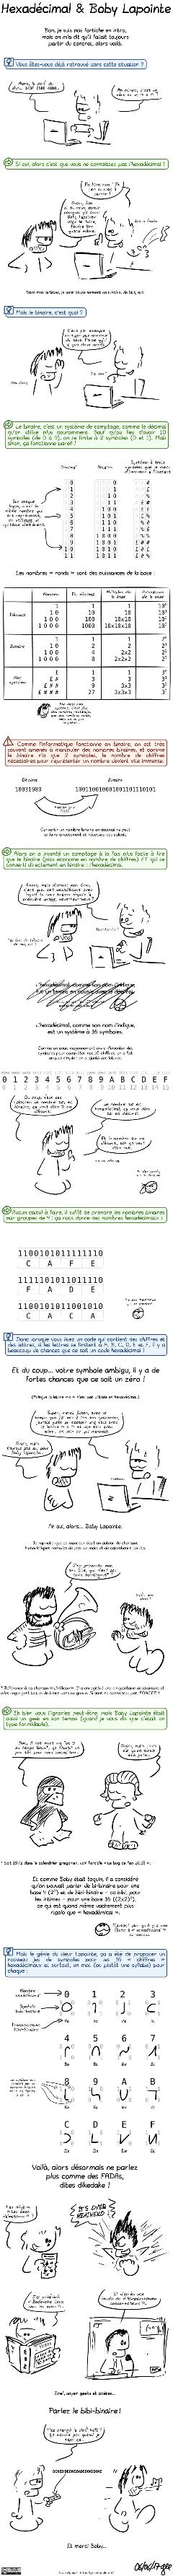 Hexadécimal & Boby Lapointe